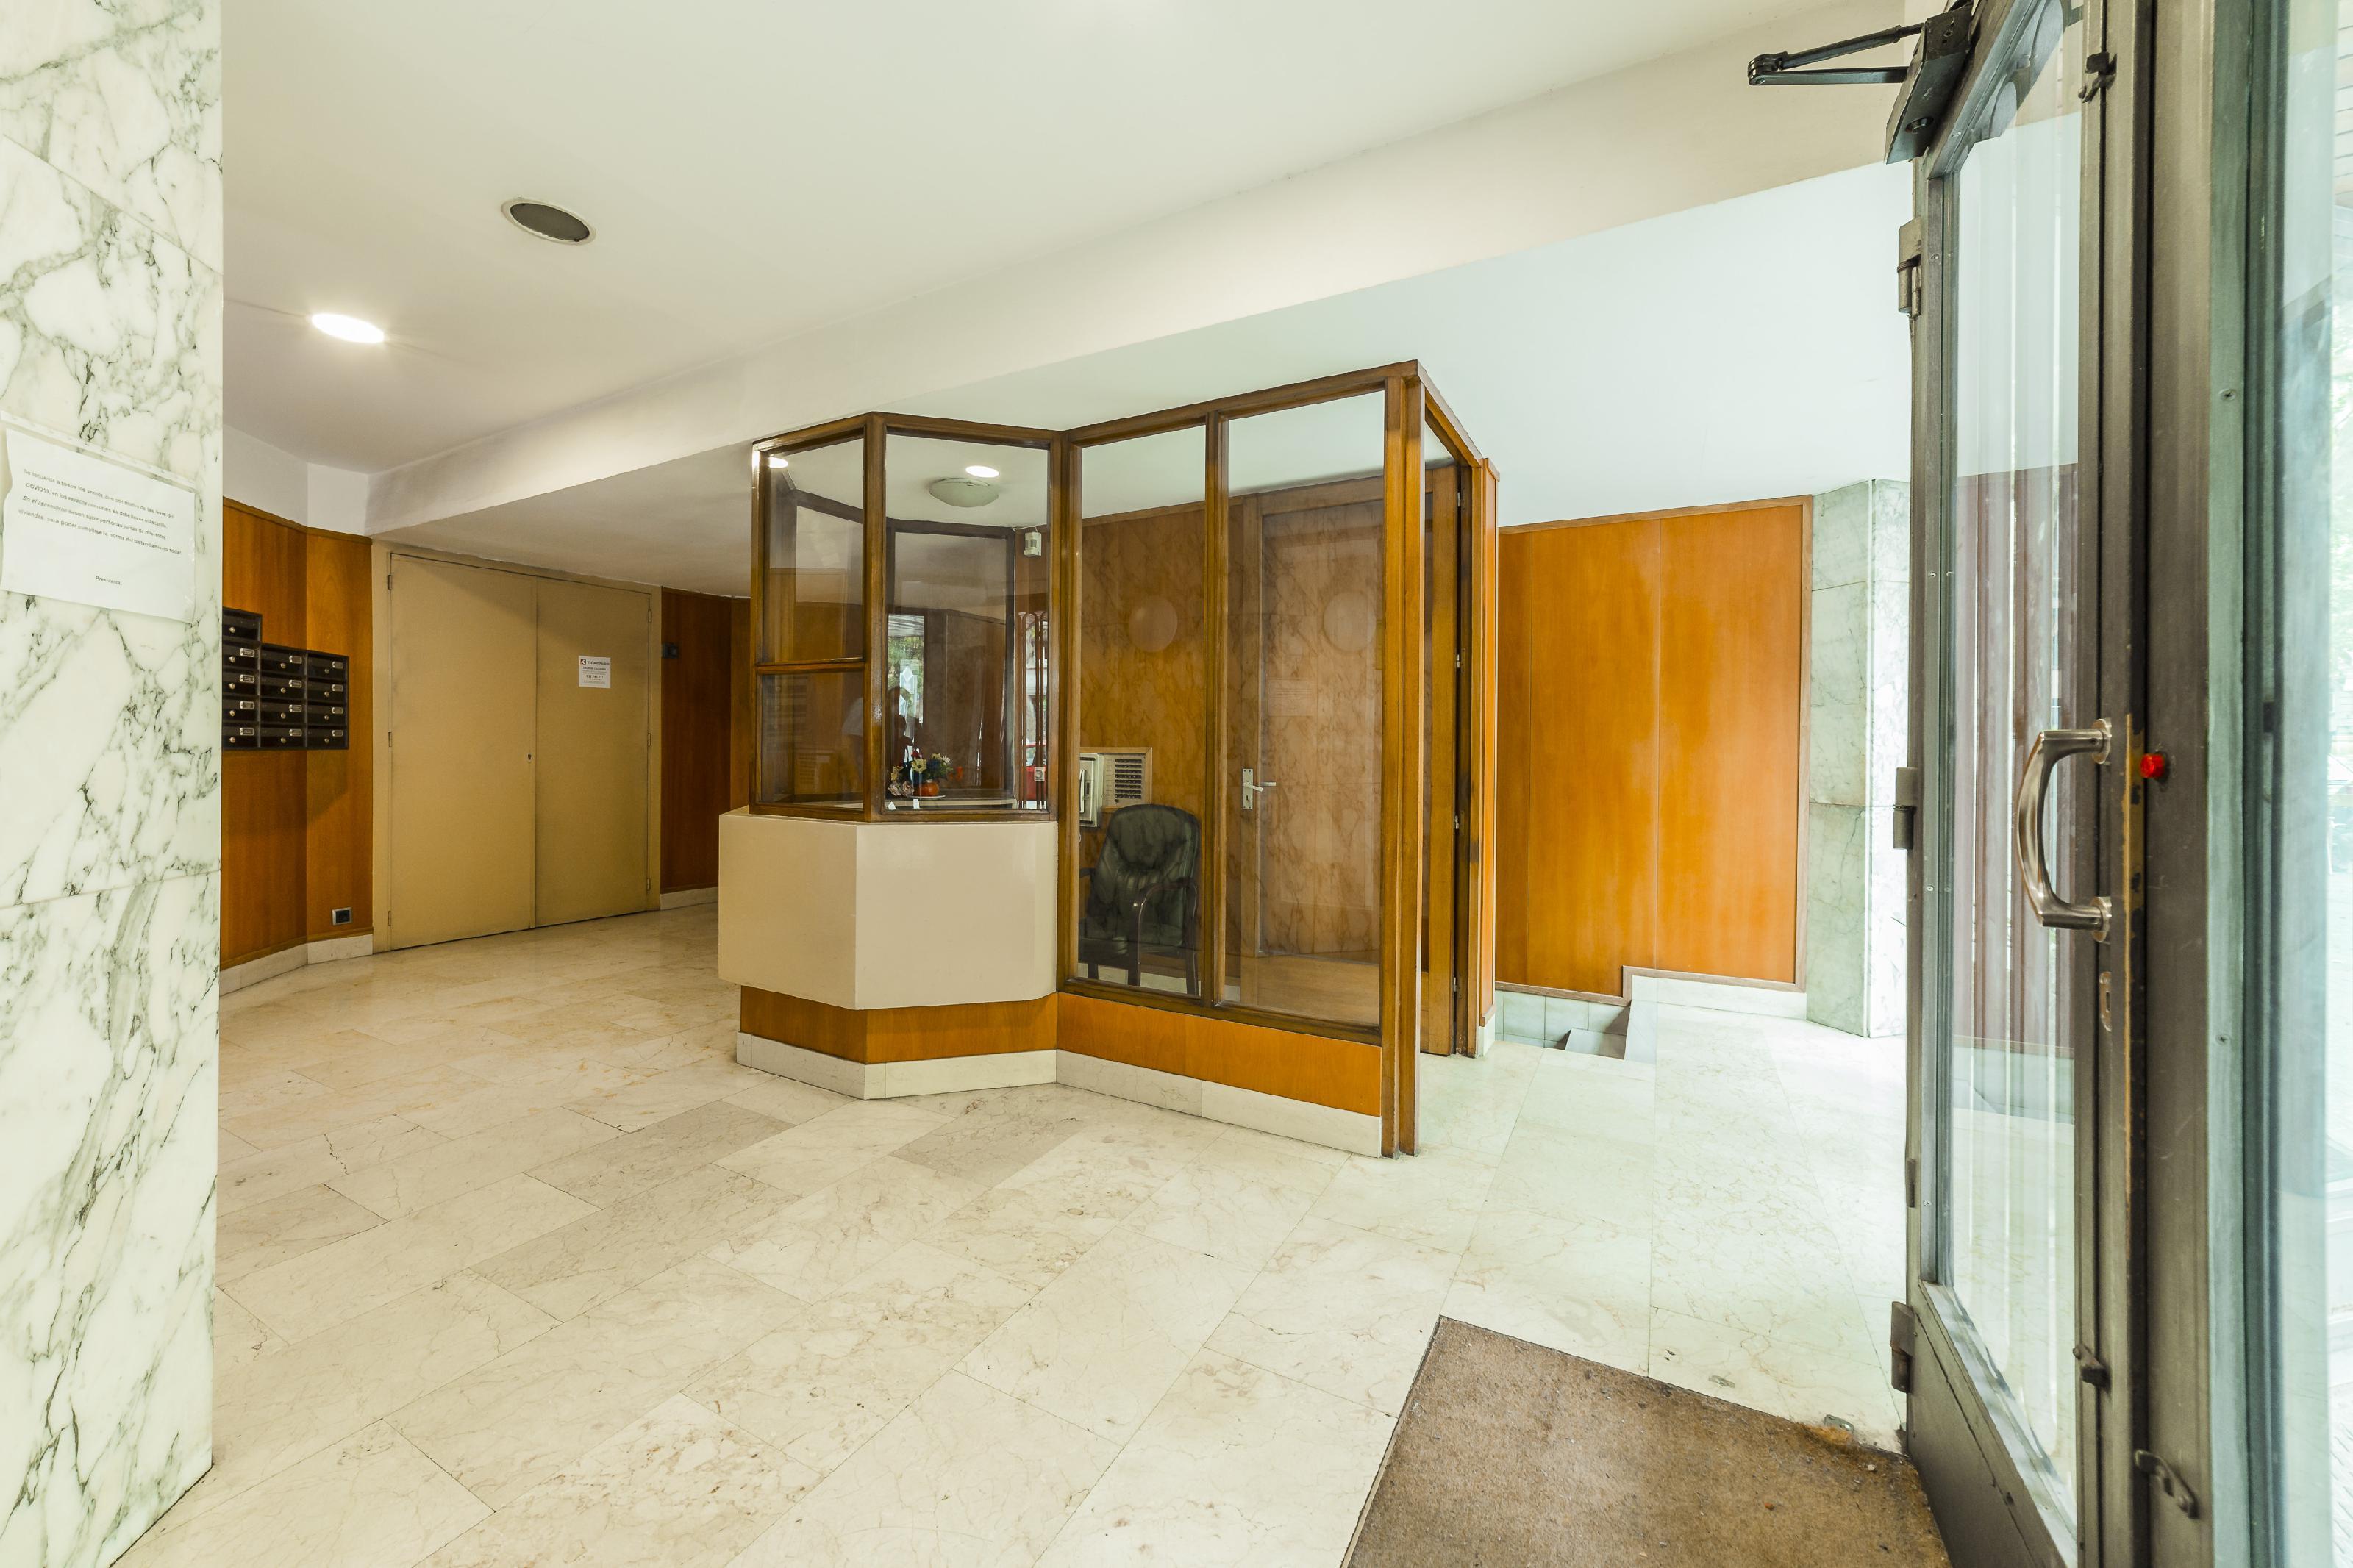 247624 Flat for sale in Eixample, Sant Antoni 26